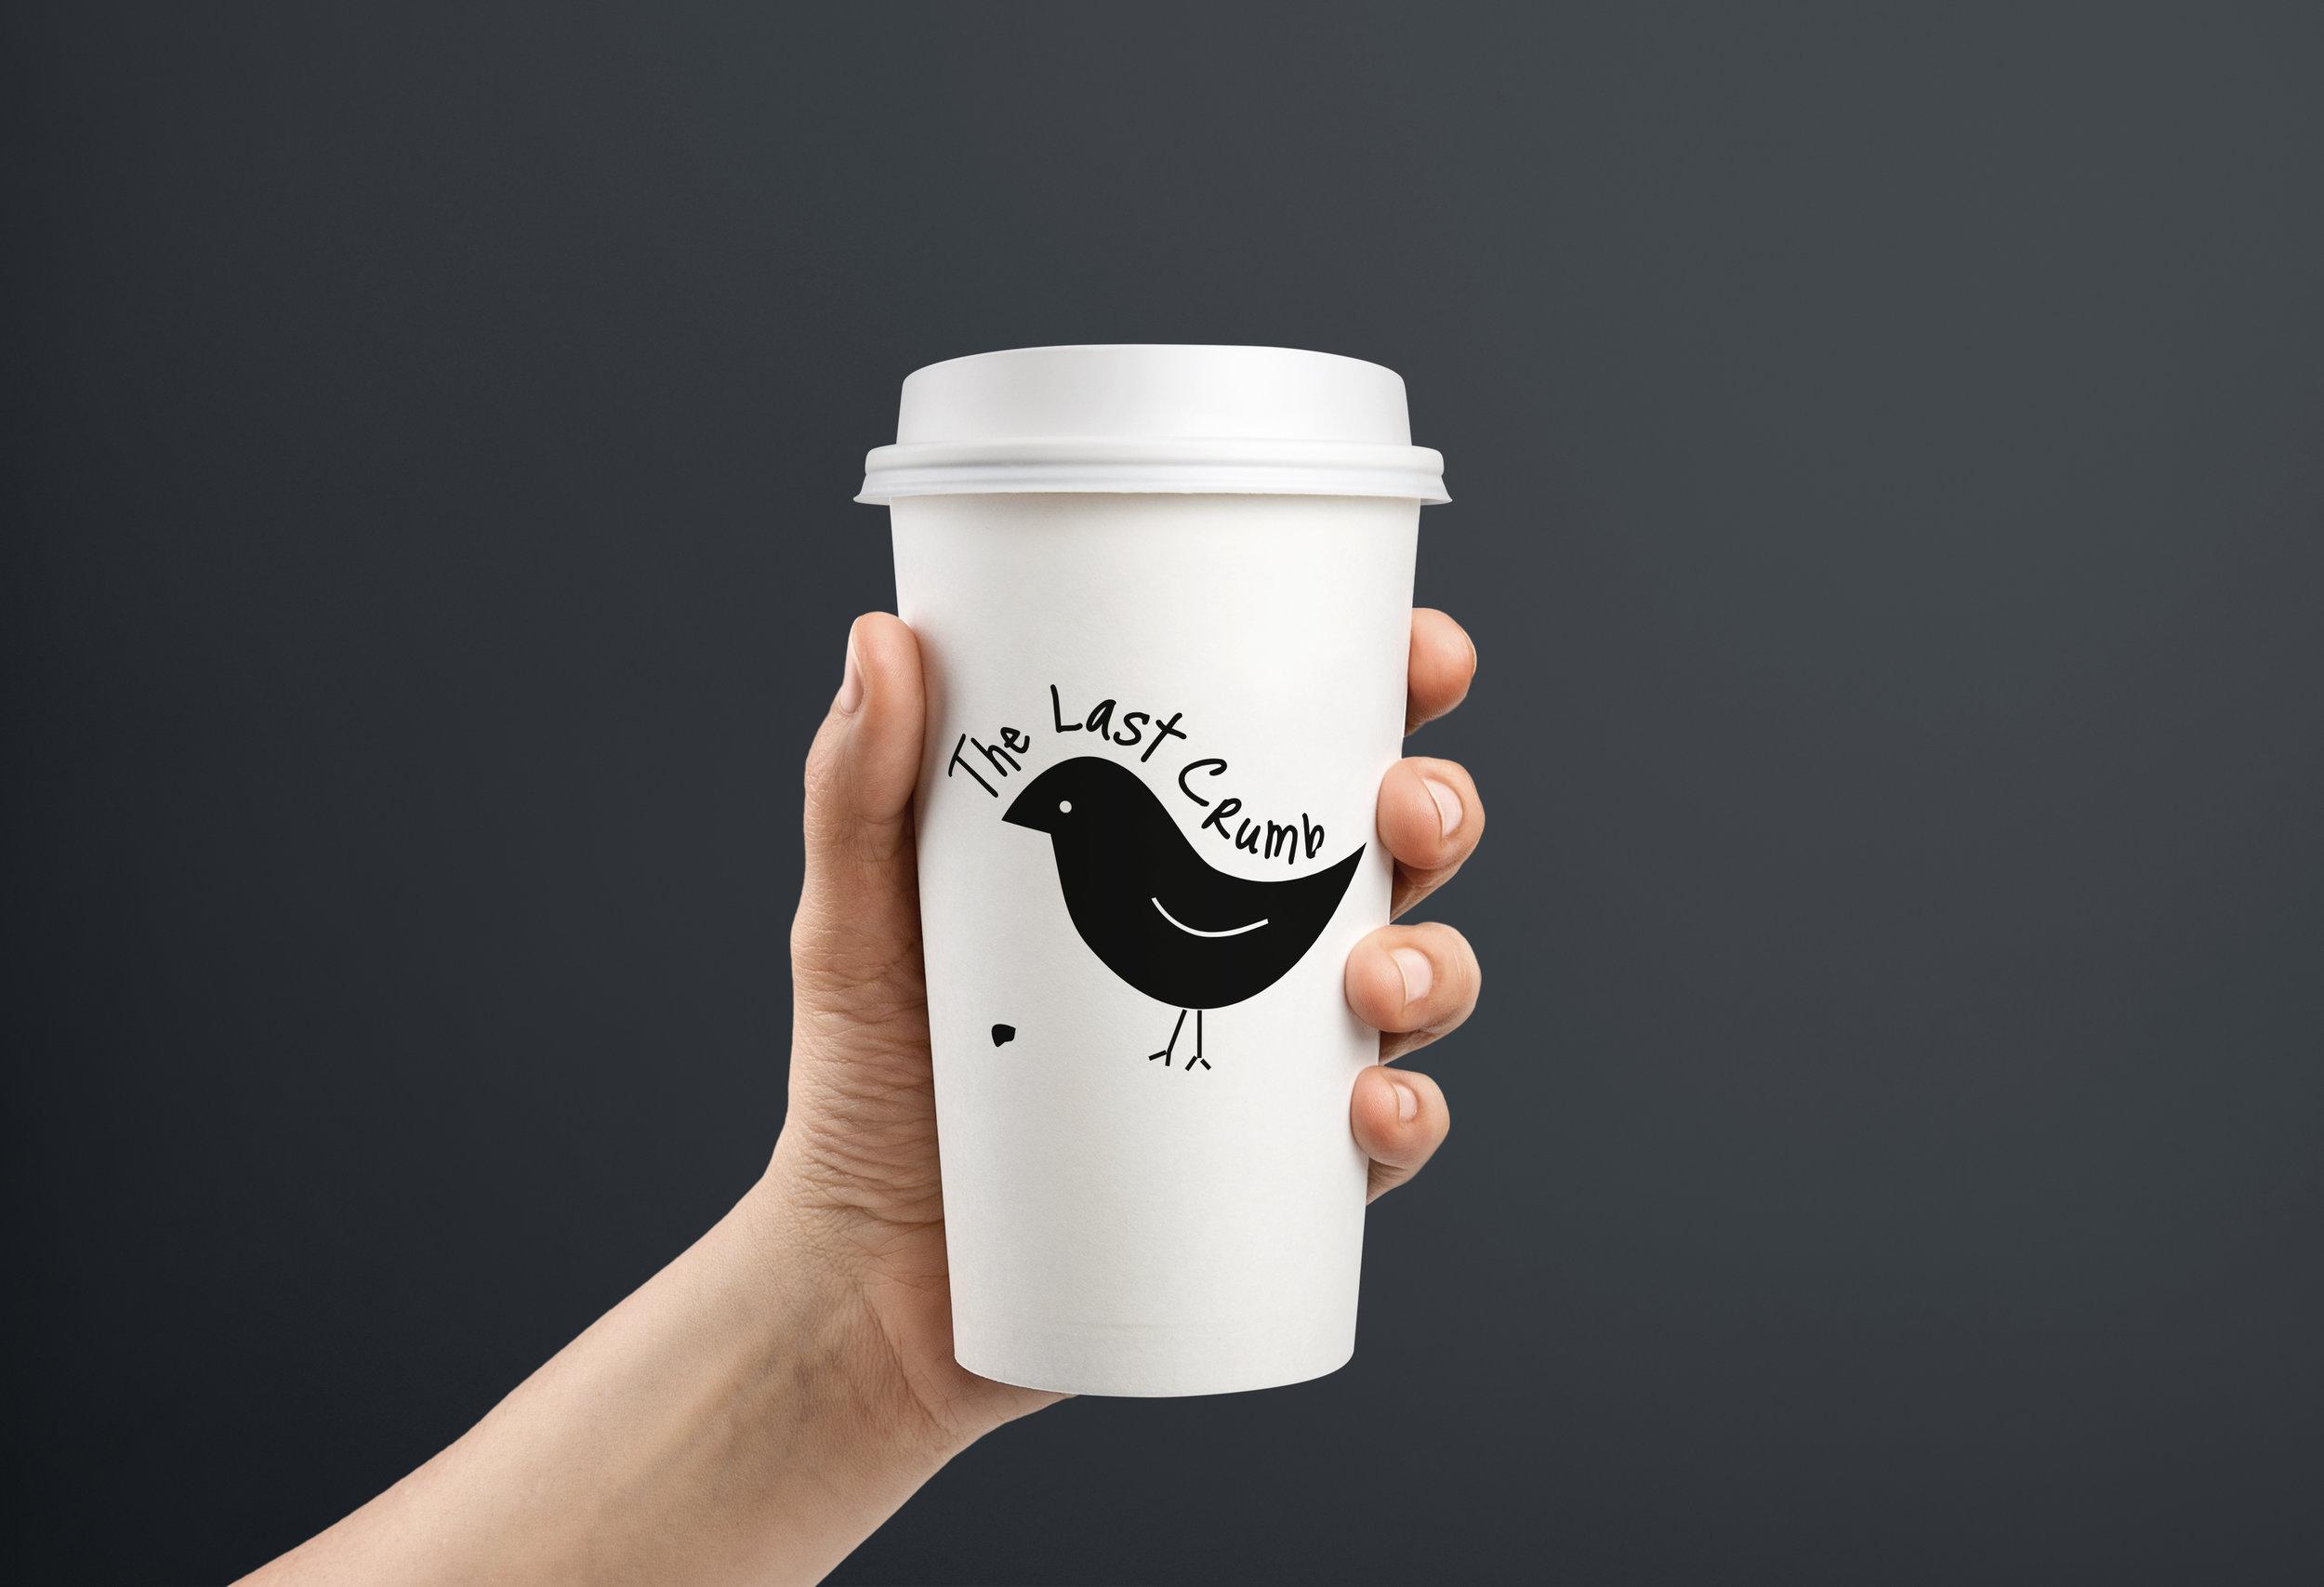 TLC_large_coffee.jpg